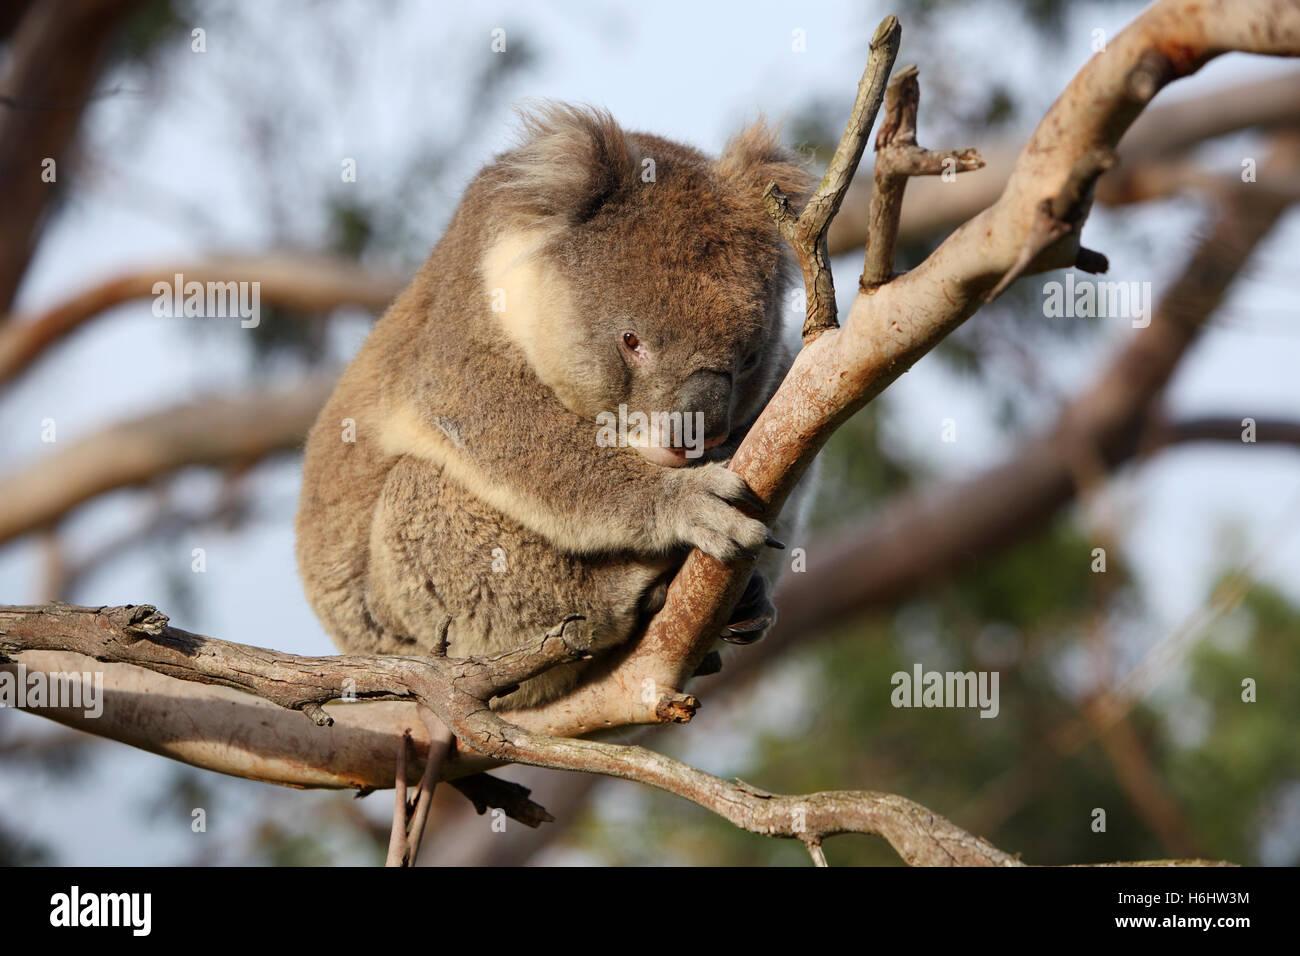 Koala in a gumtree. Great Otway National Park, Victoria, Australia. - Stock Image